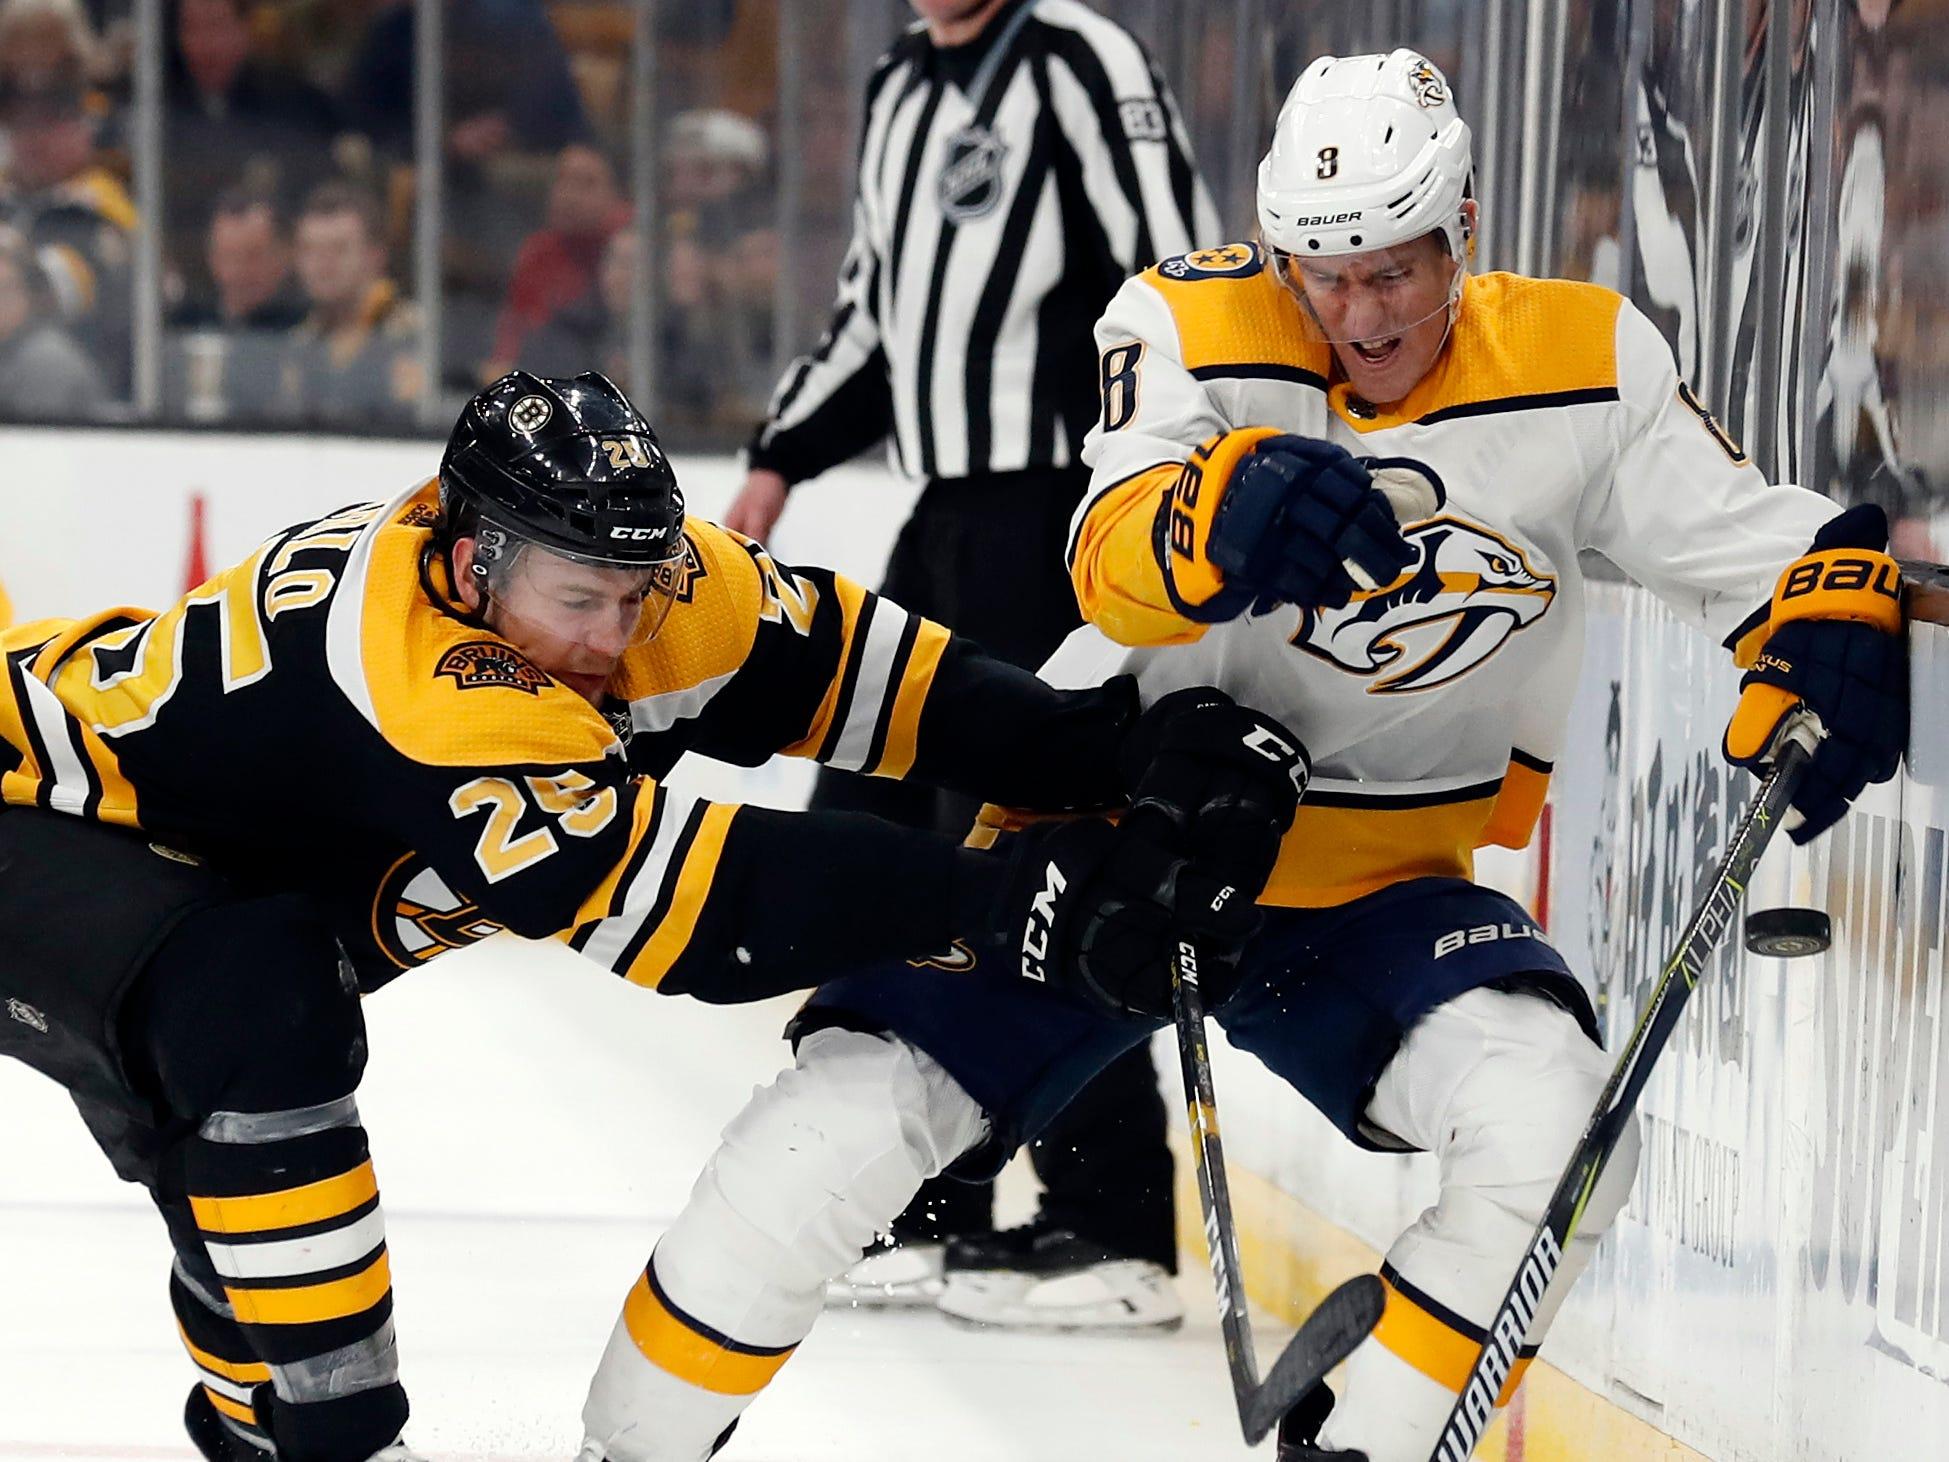 Boston Bruins defenseman Brandon Carlo (25) checks Nashville Predators center Kyle Turris (8) into the boards during the third period of Boston's 5-2 win at TD Garden.